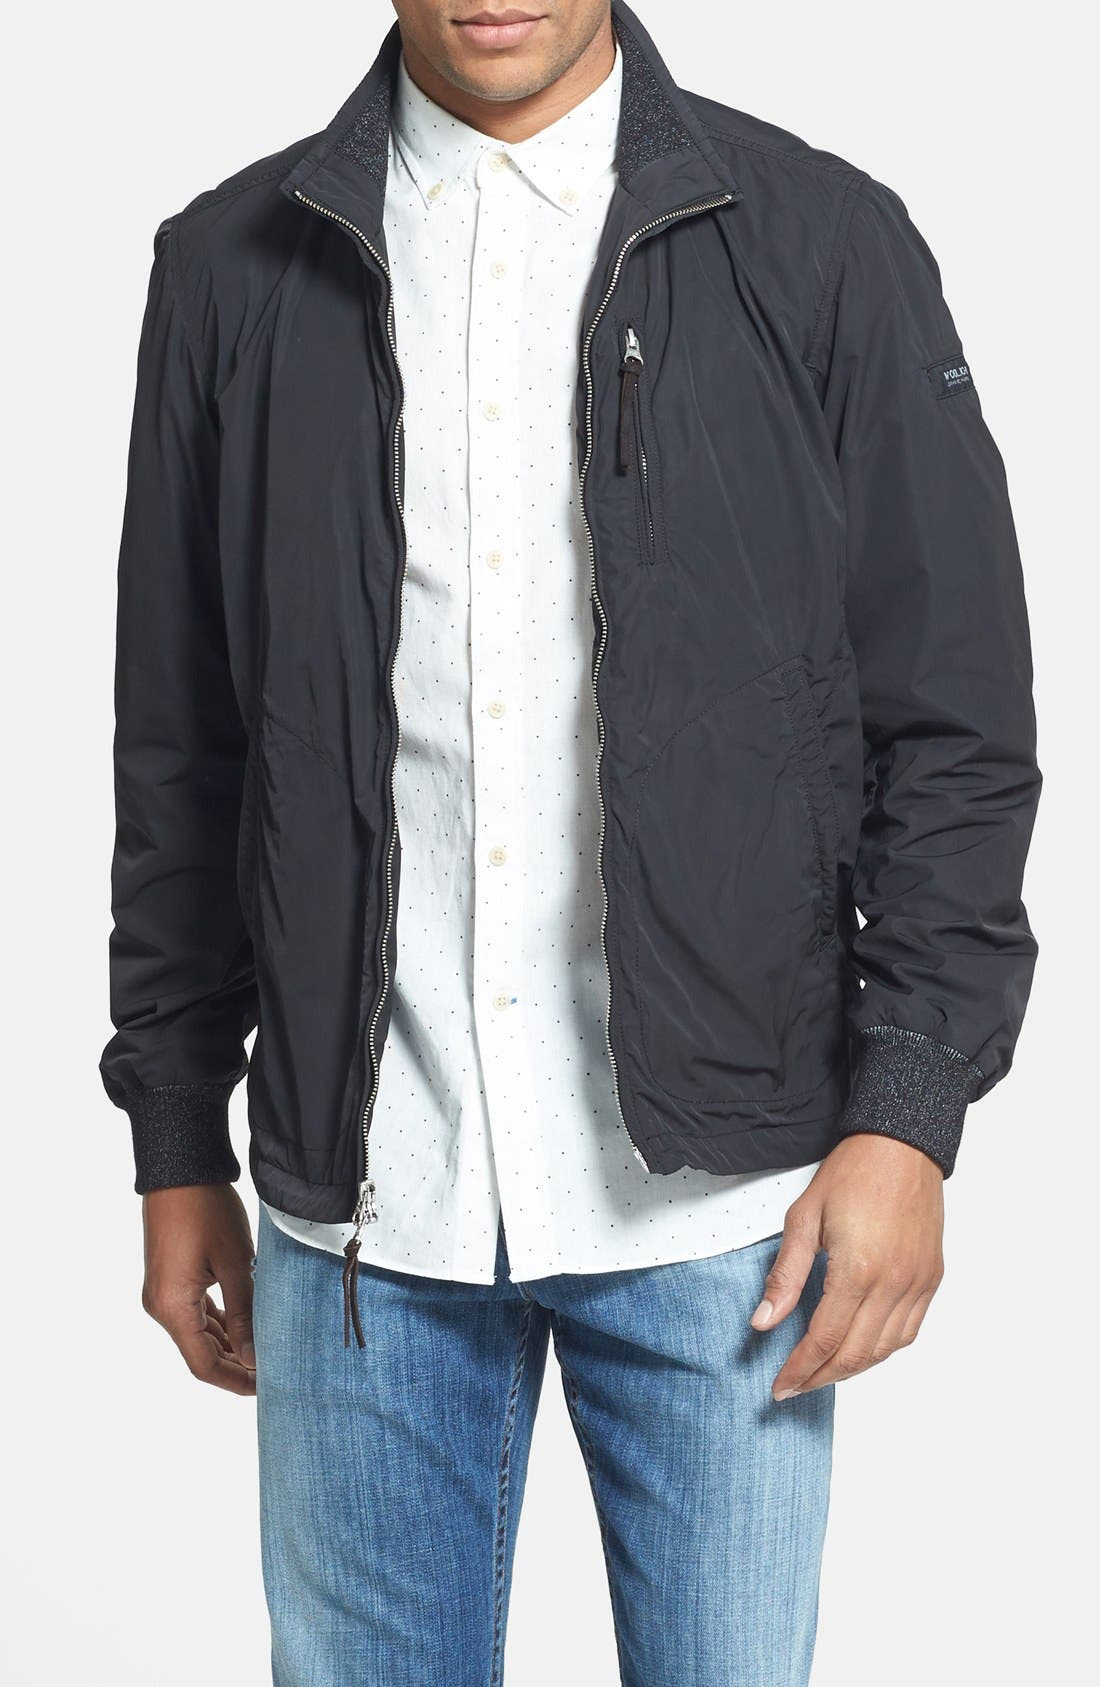 Main Image - Woolrich 'Pine' Weather Resistant Moto Jacket